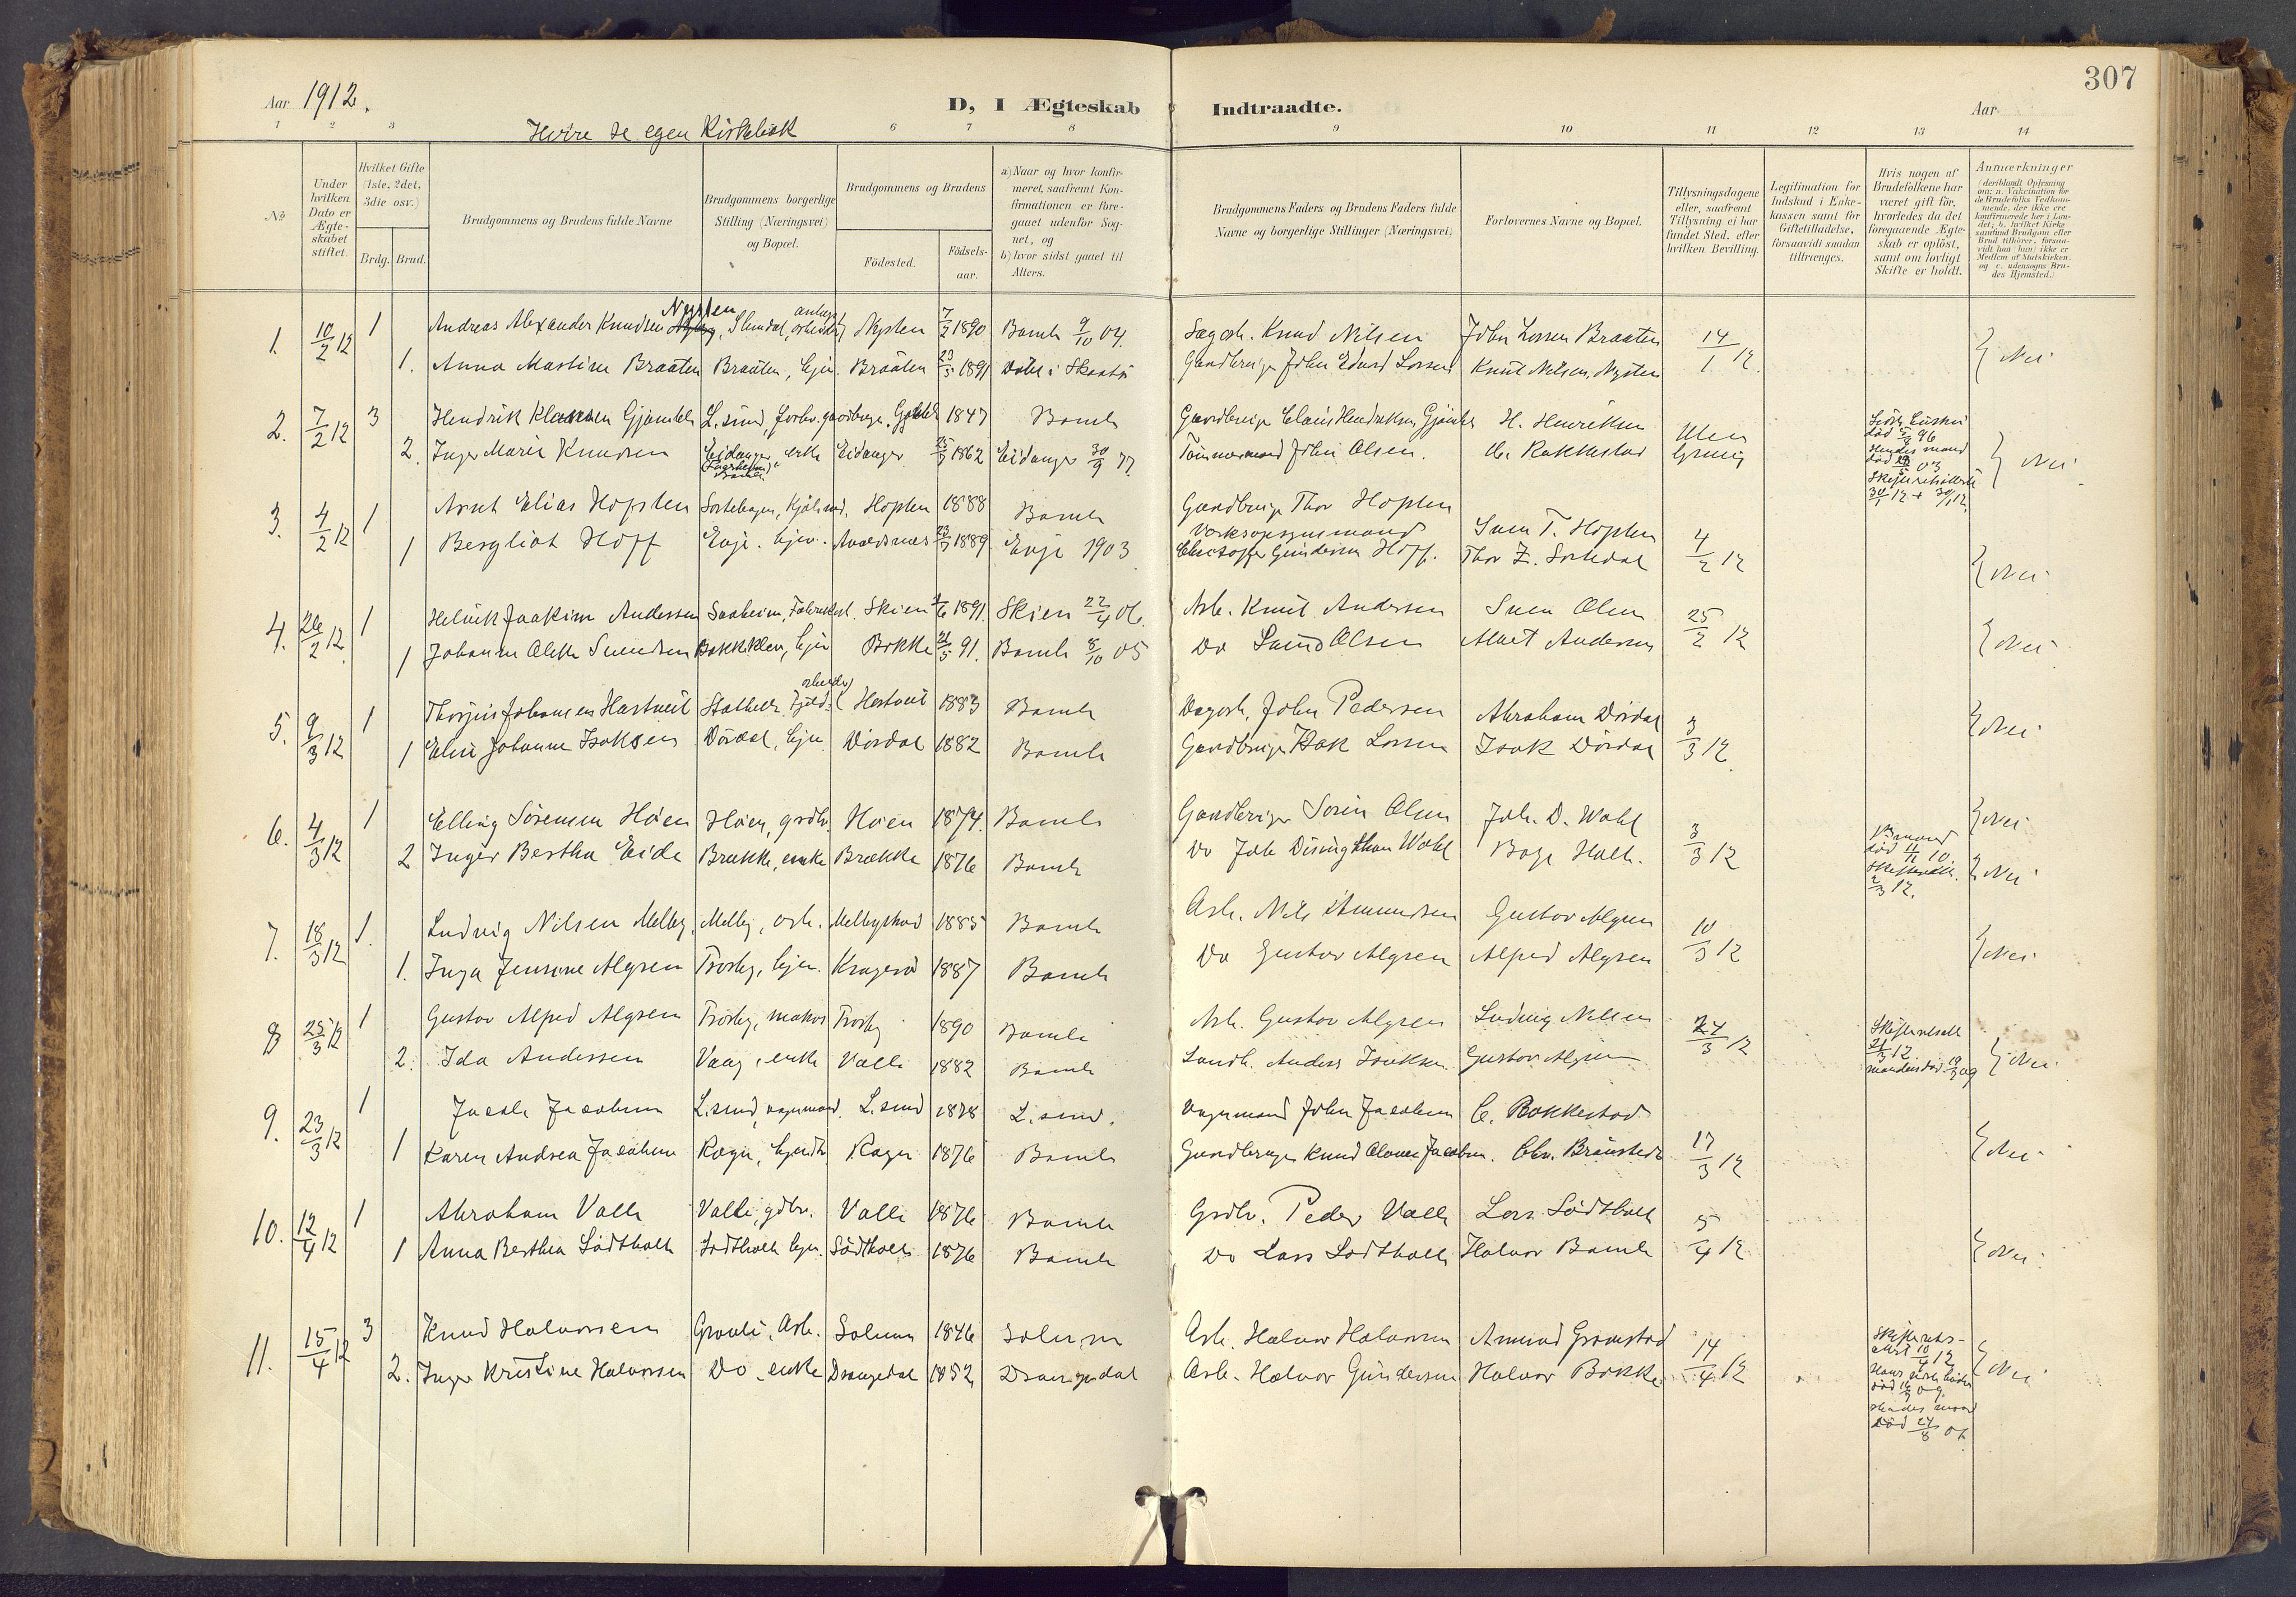 SAKO, Bamble kirkebøker, F/Fa/L0009: Ministerialbok nr. I 9, 1901-1917, s. 307